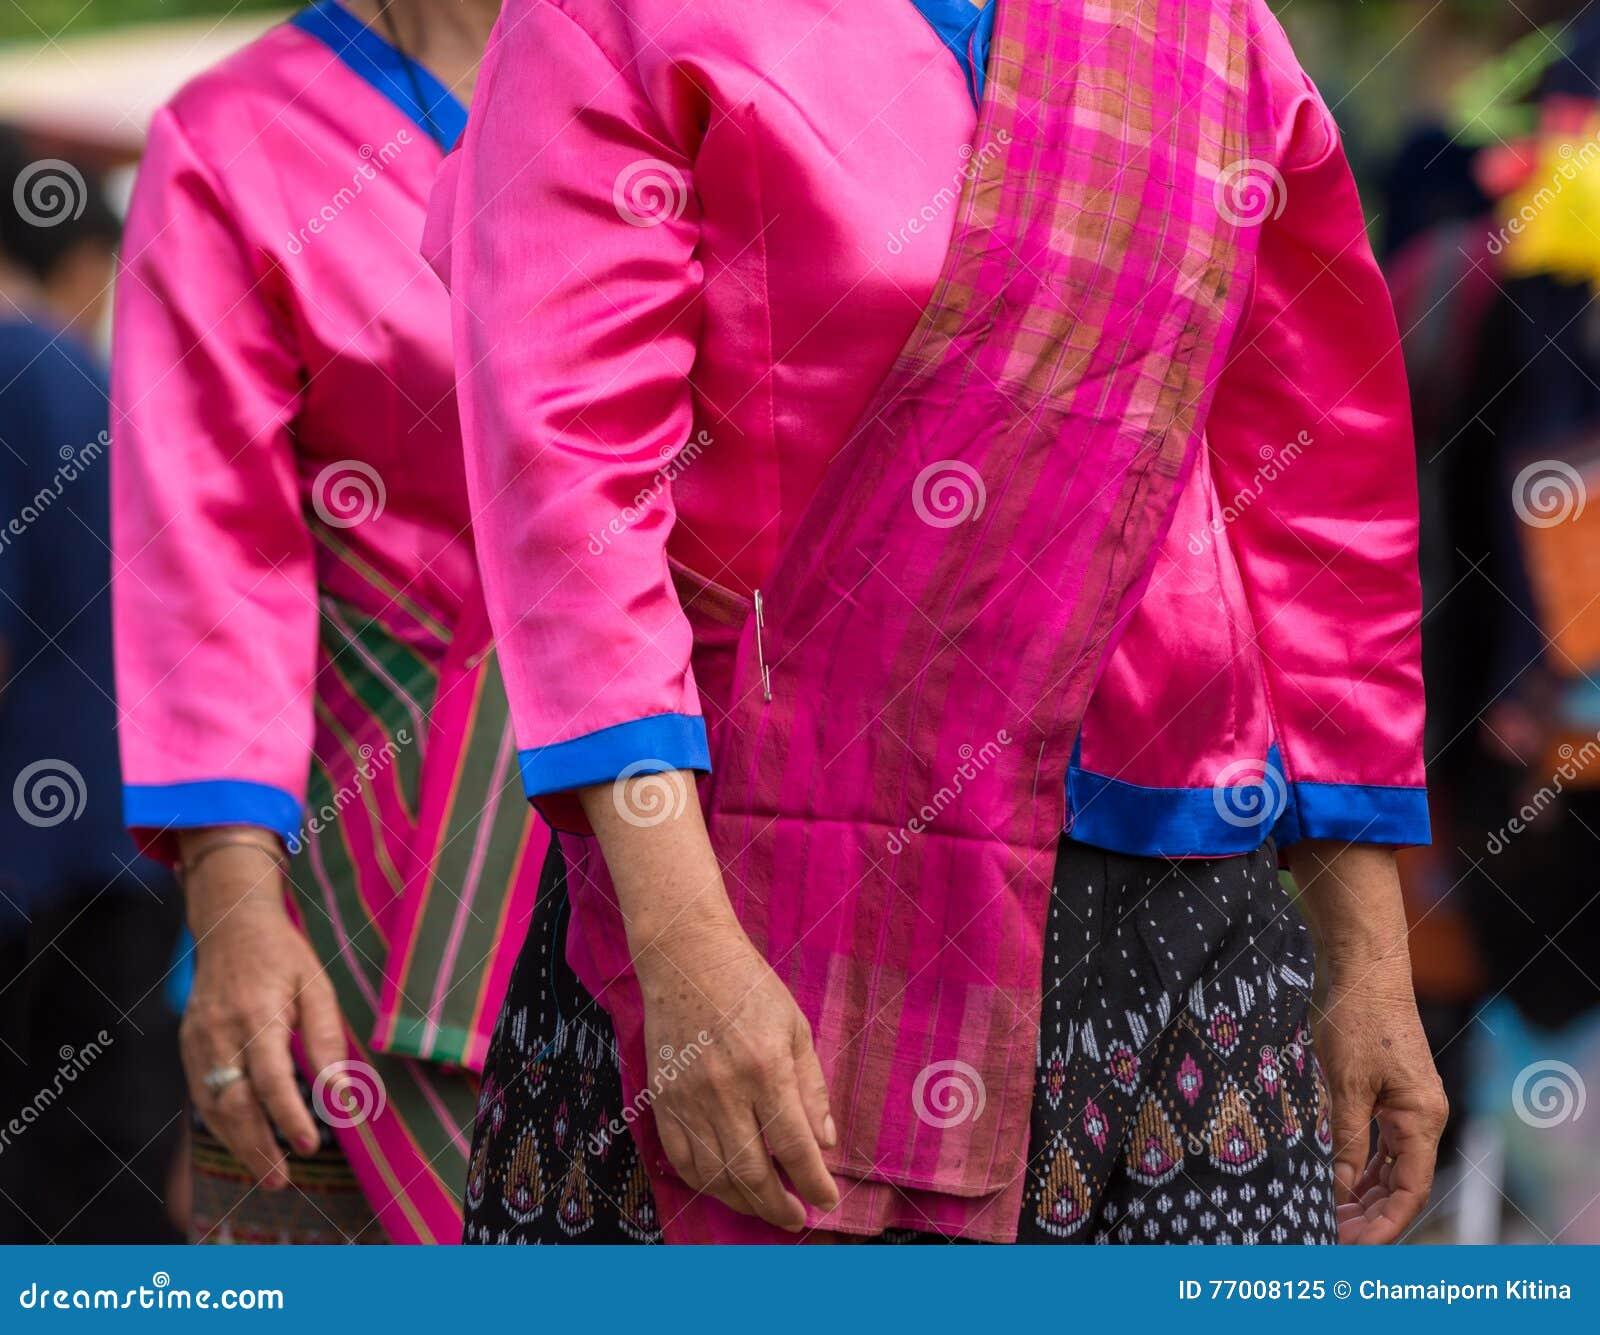 Local dress of female in Thai wax festival.